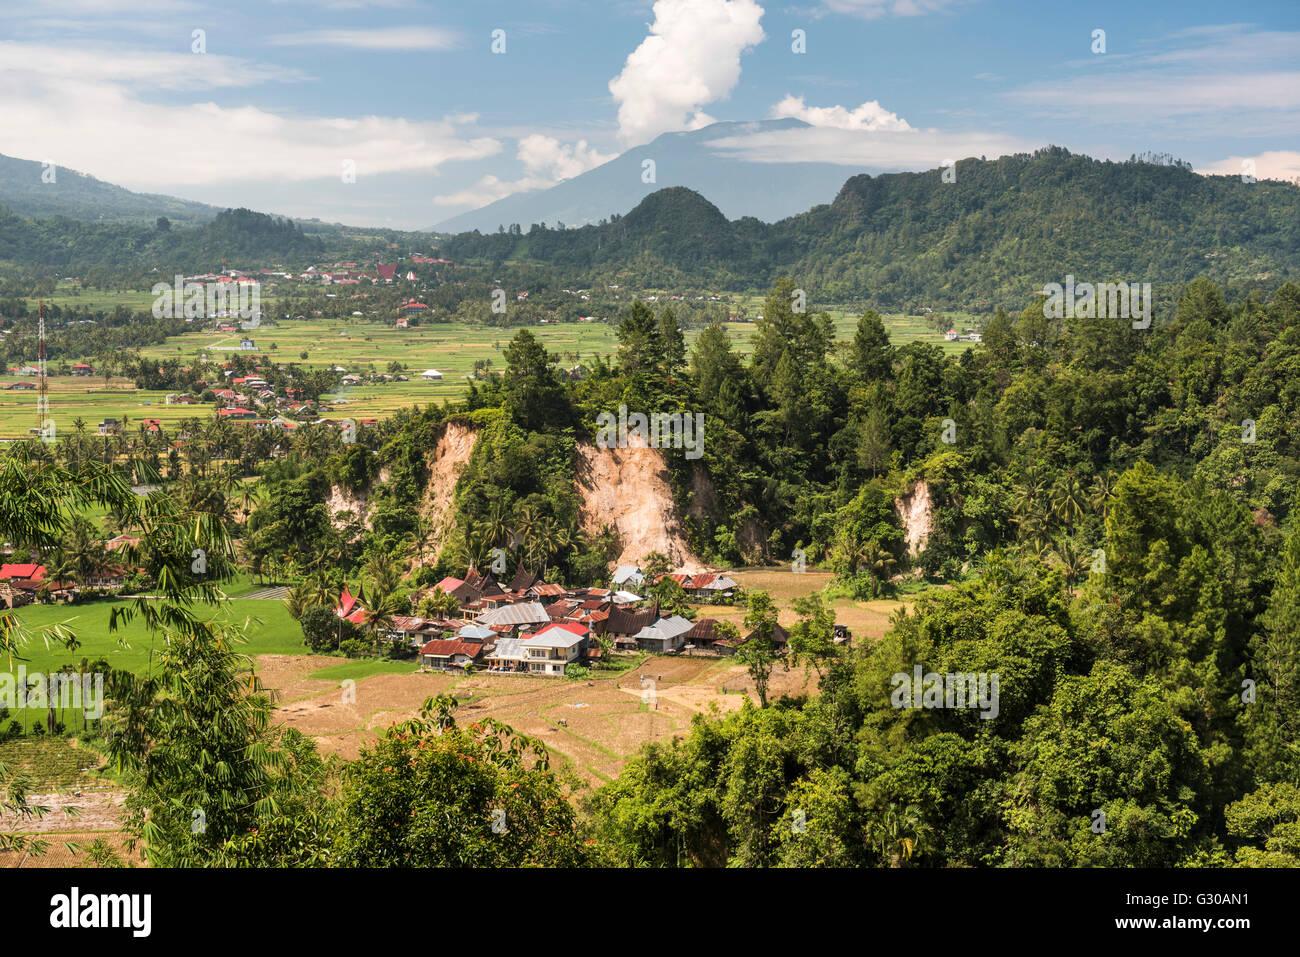 Traditional farming village of Sungai Angek near Bukittinggi, West Sumatra, Indonesia, Southeast Asia, Asia - Stock Image